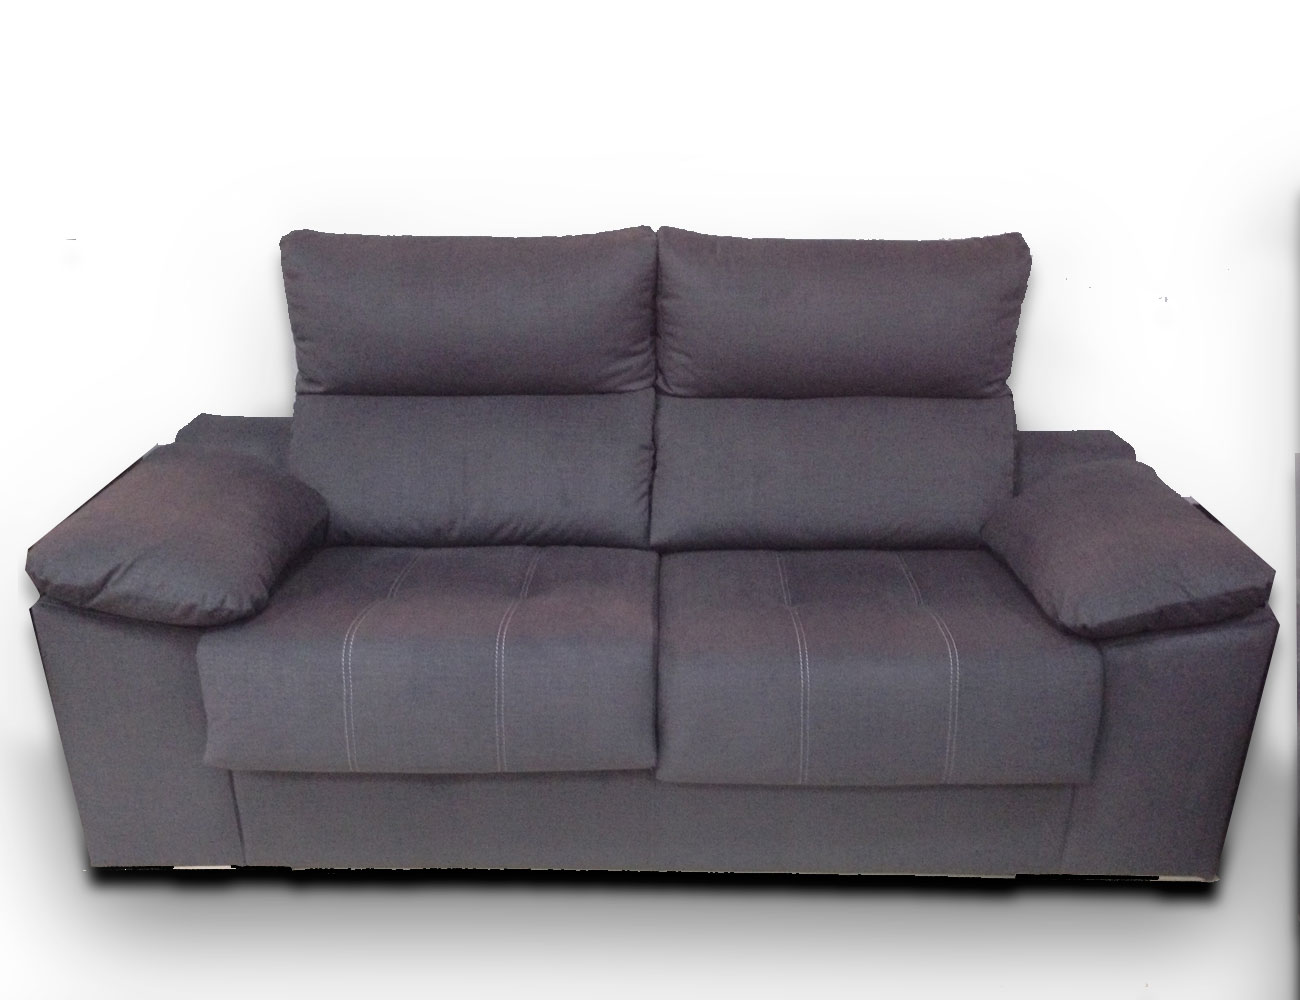 Sofa 3 plazas1